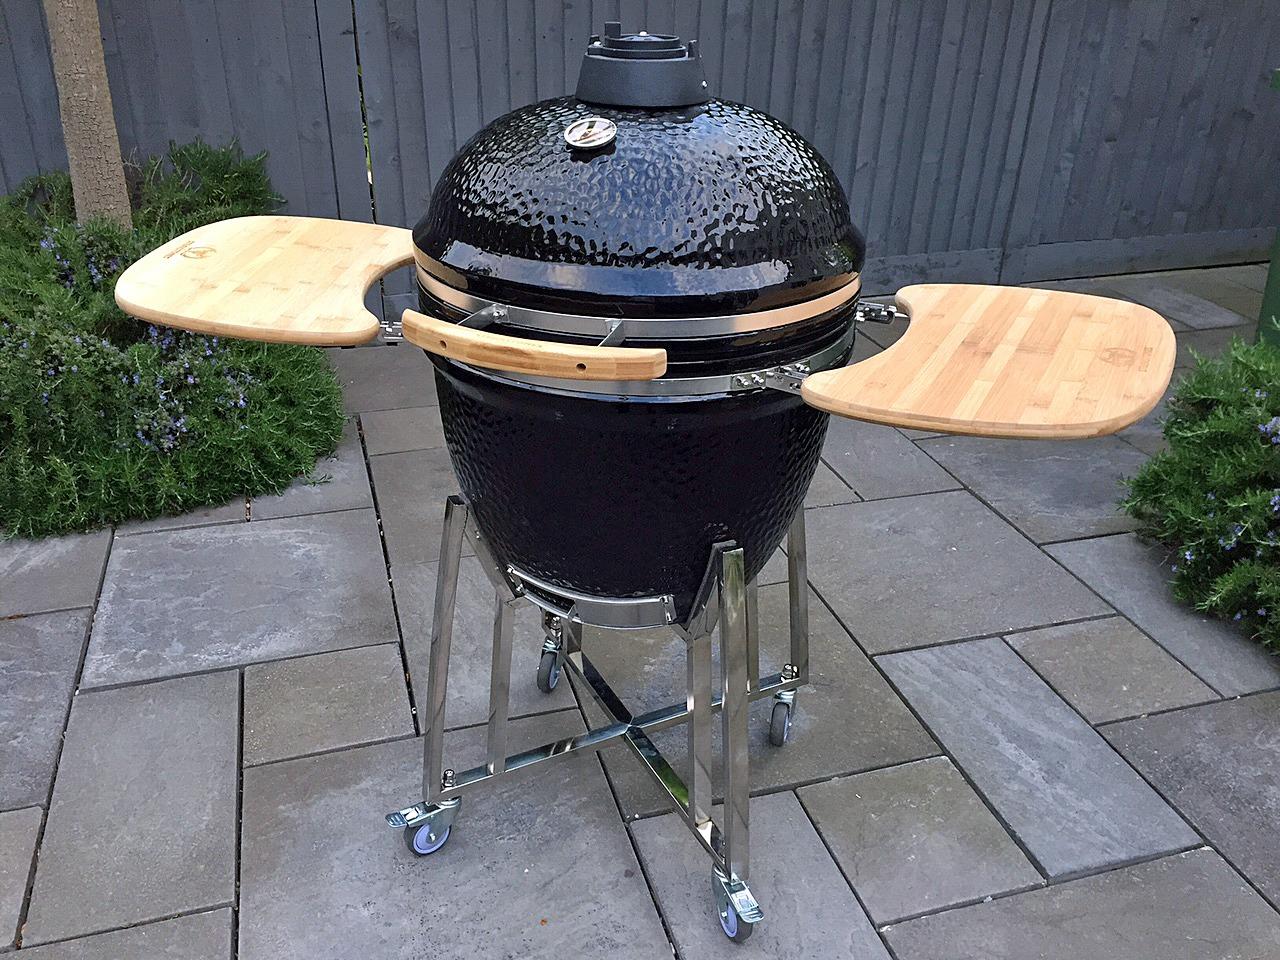 steakstones kamado raucher & grill (ss00ksg)-steakstones